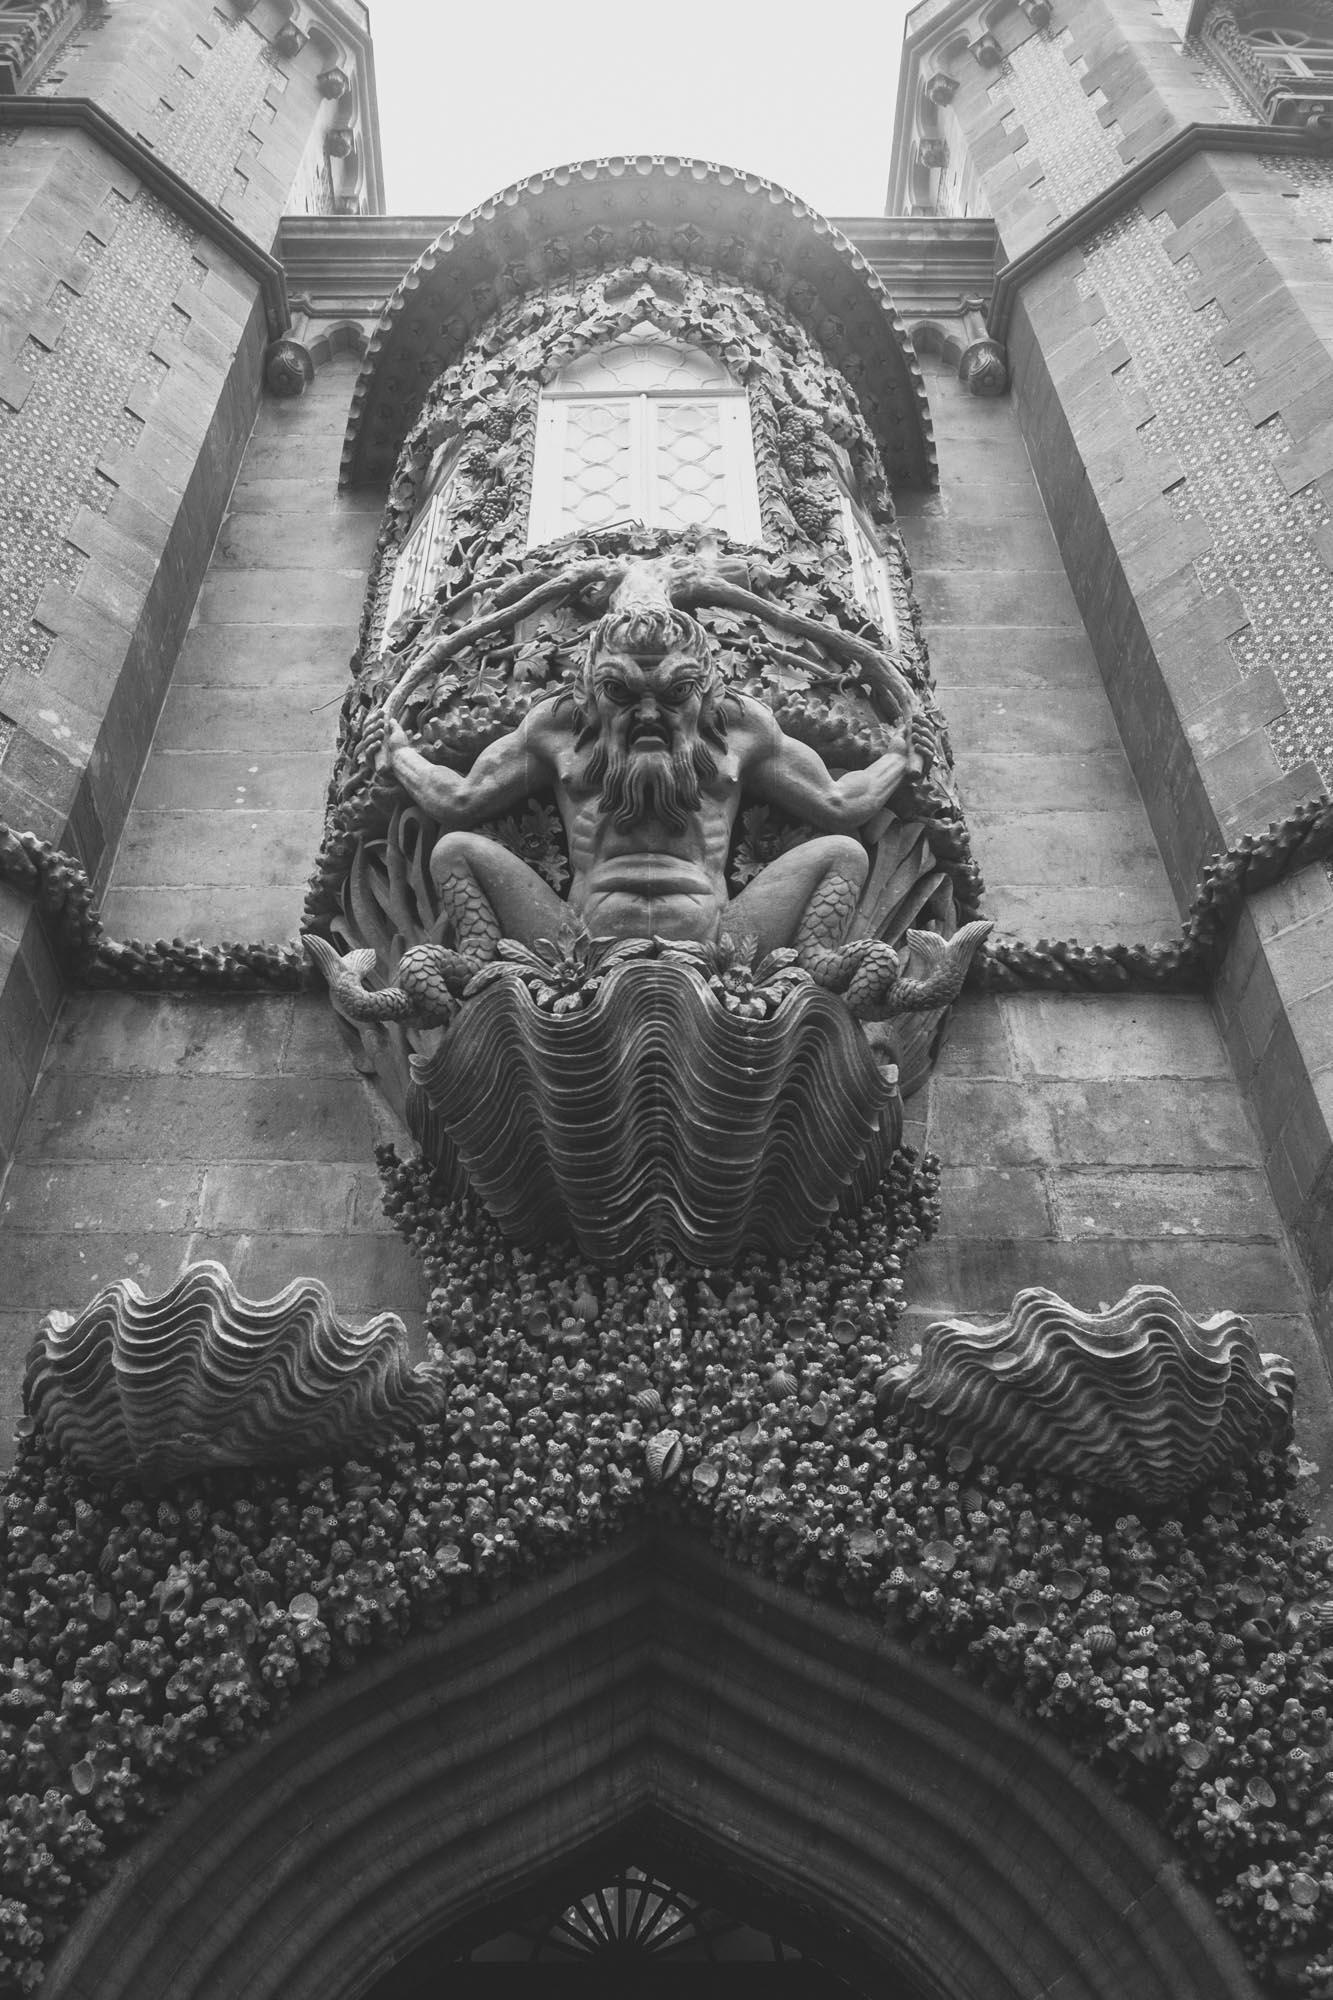 Eclectic decorative element of Palacio de Pena. Such an aftermath